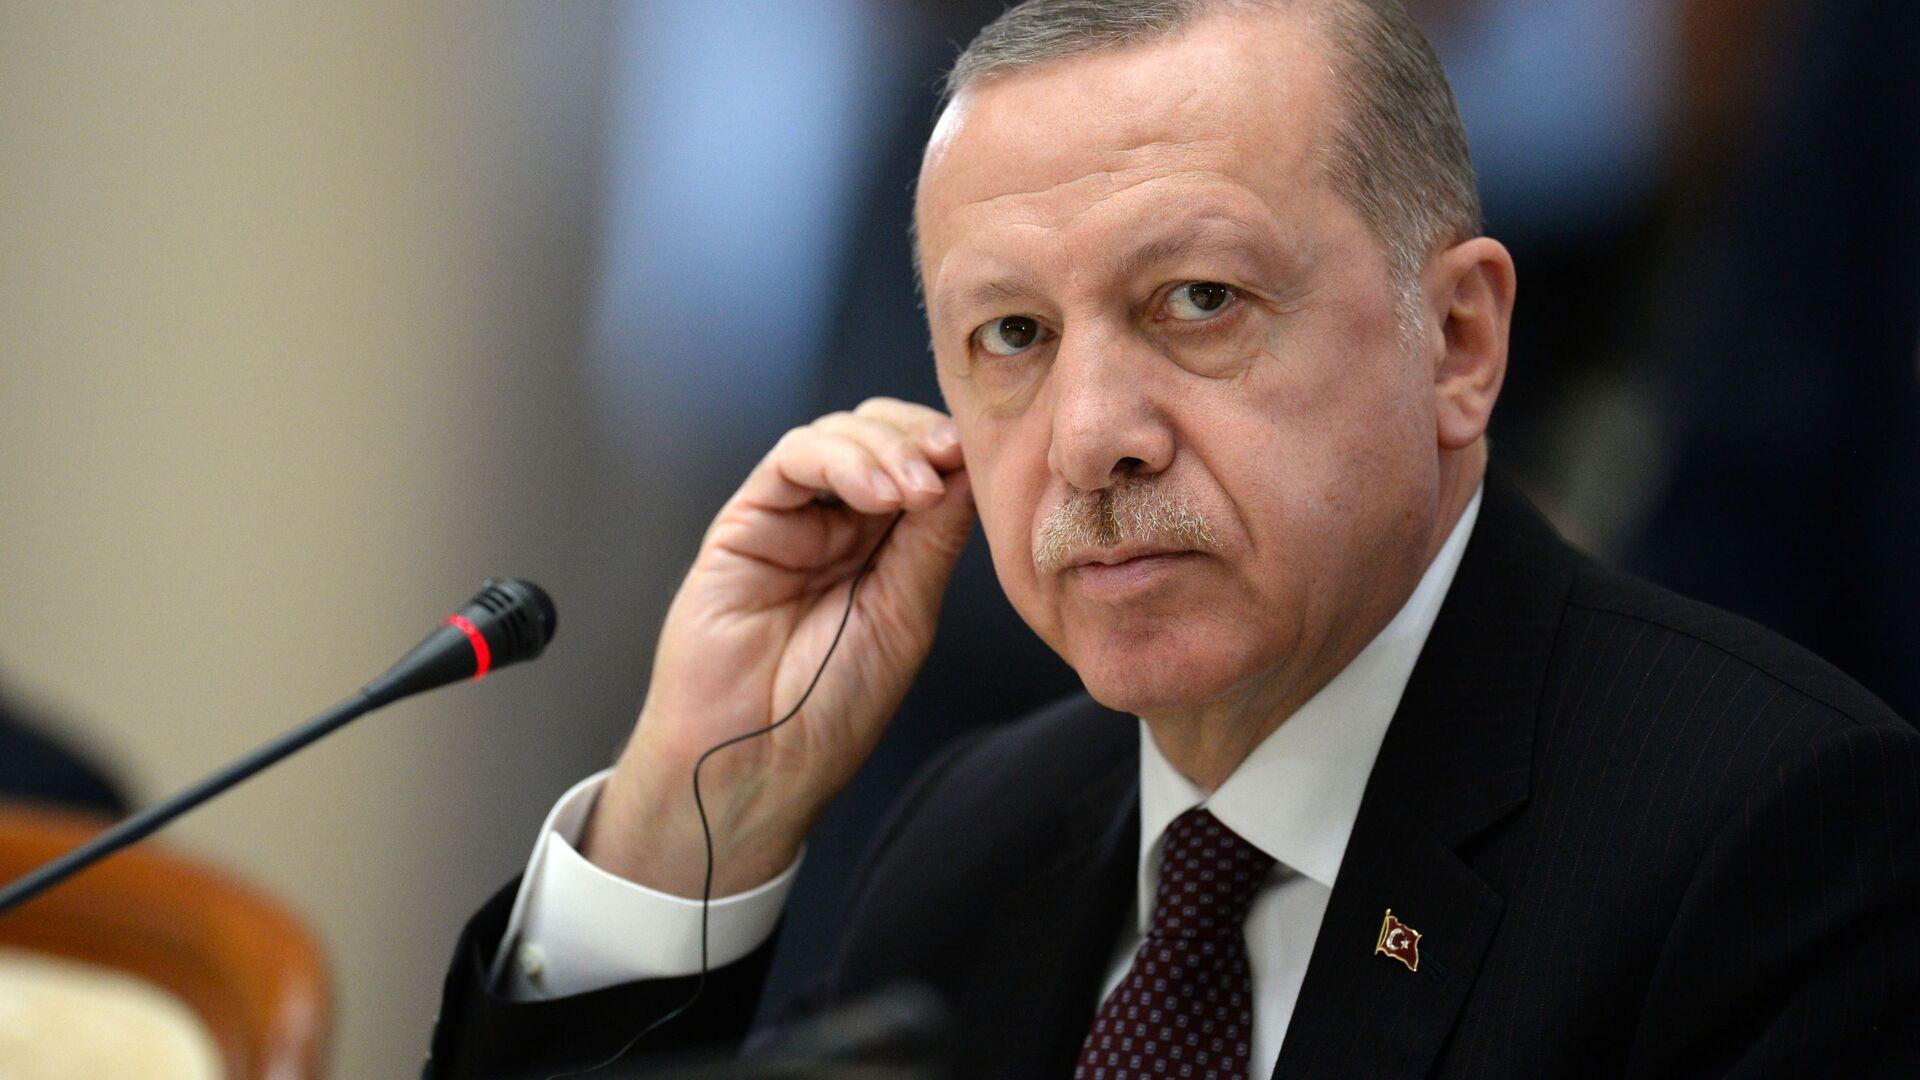 Il presidente turco Recep Tayyip Erdogan - Sputnik Italia, 1920, 26.07.2021